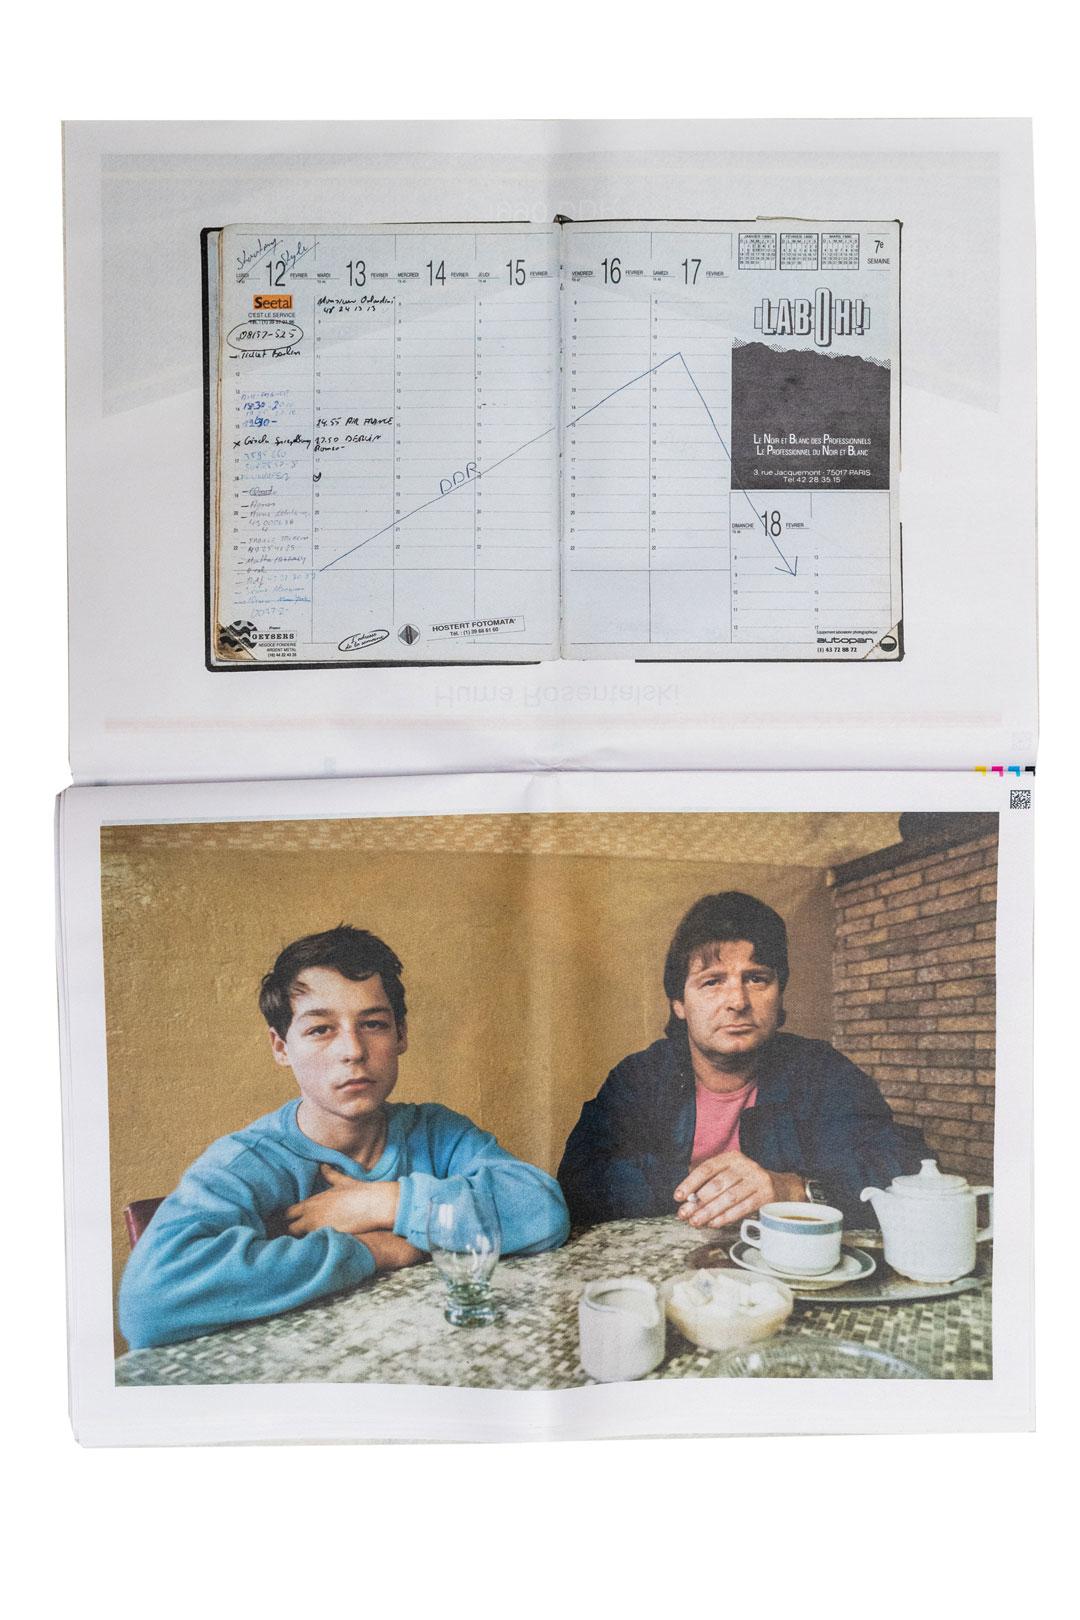 hands-on-papers-Huma-Rosentalski-1990DDR-2